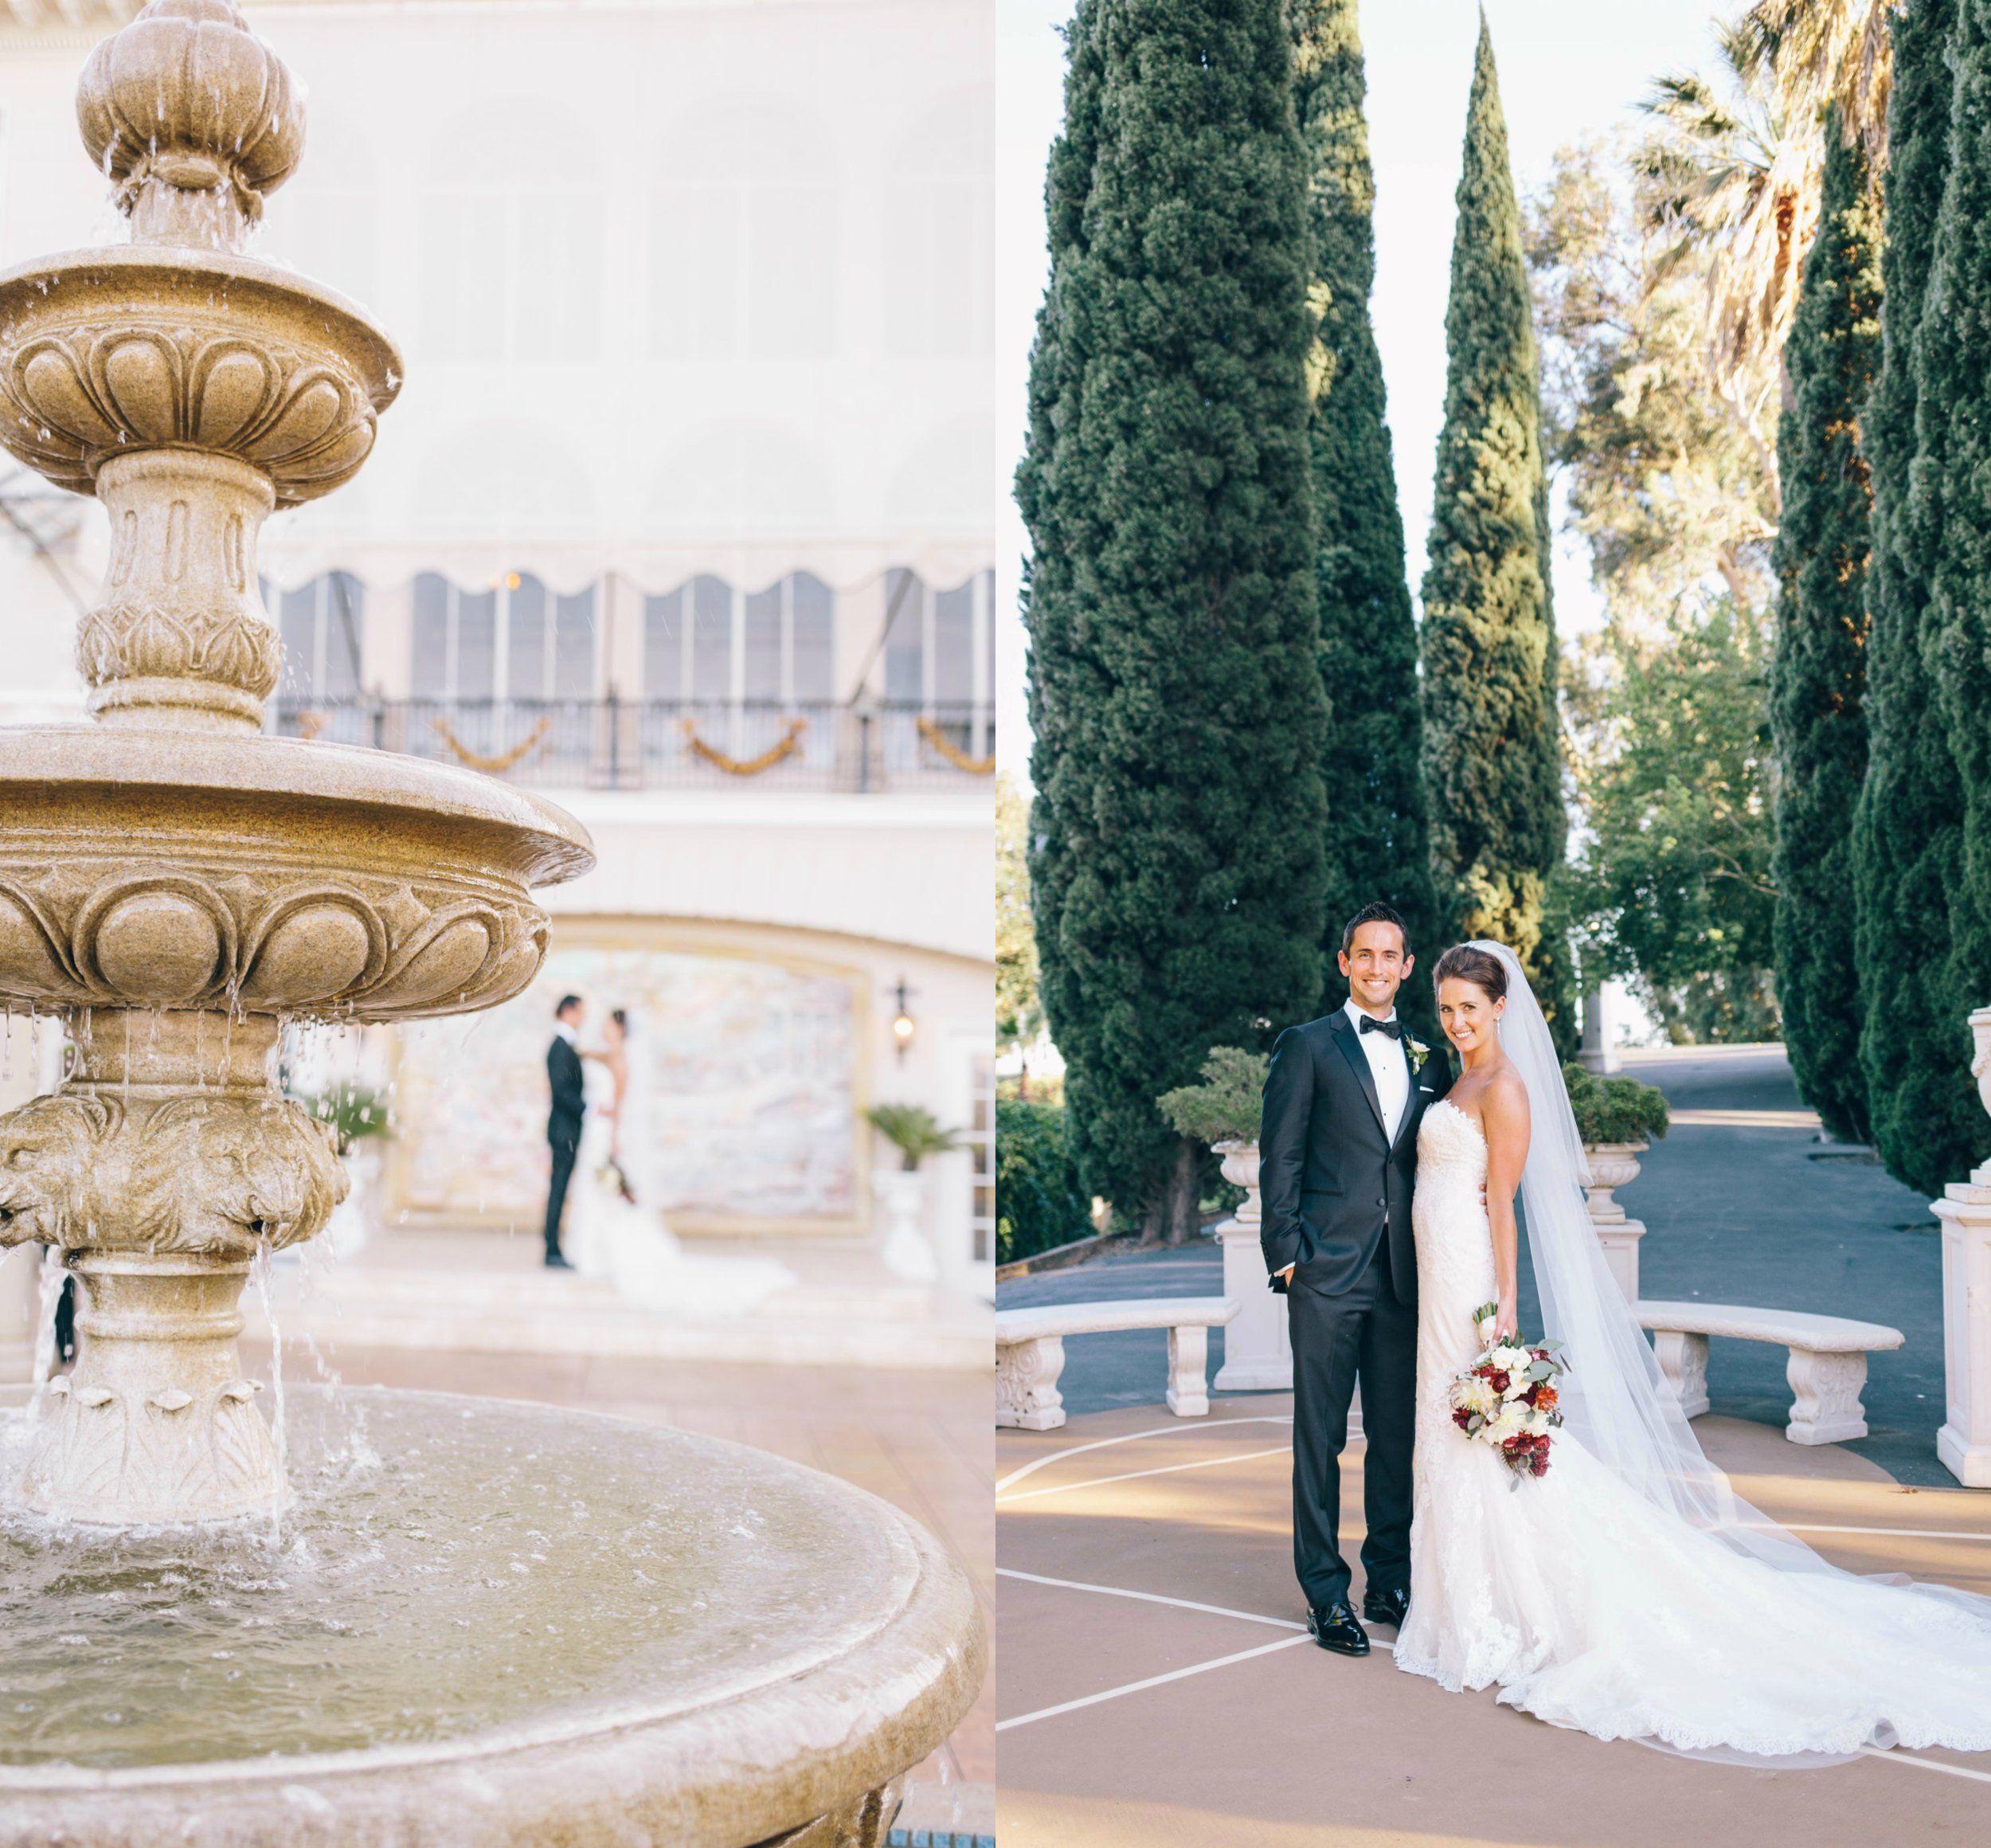 wedding receptions sacramento ca%0A San Francisco Wedding Venues  Grand Island Mansion Wedding  Summer  JBJ  Pictures Wedding and